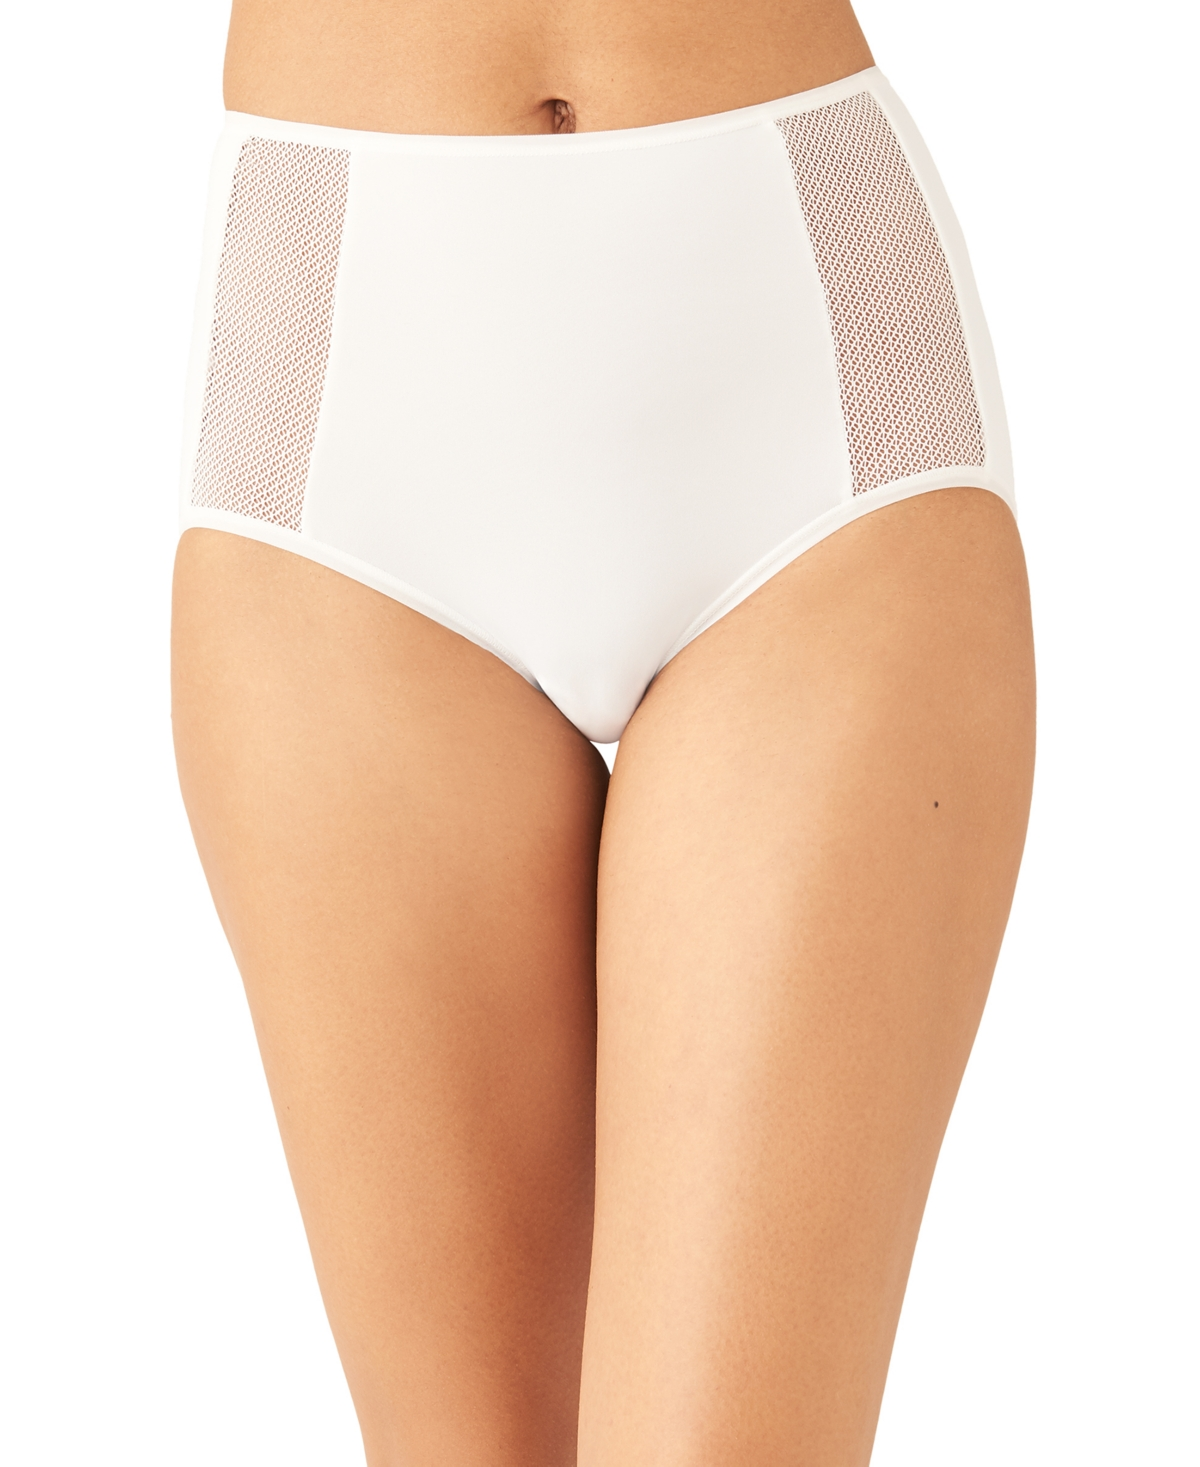 Wacoal Women's Keep Your Cool Daywear Brief Underwear